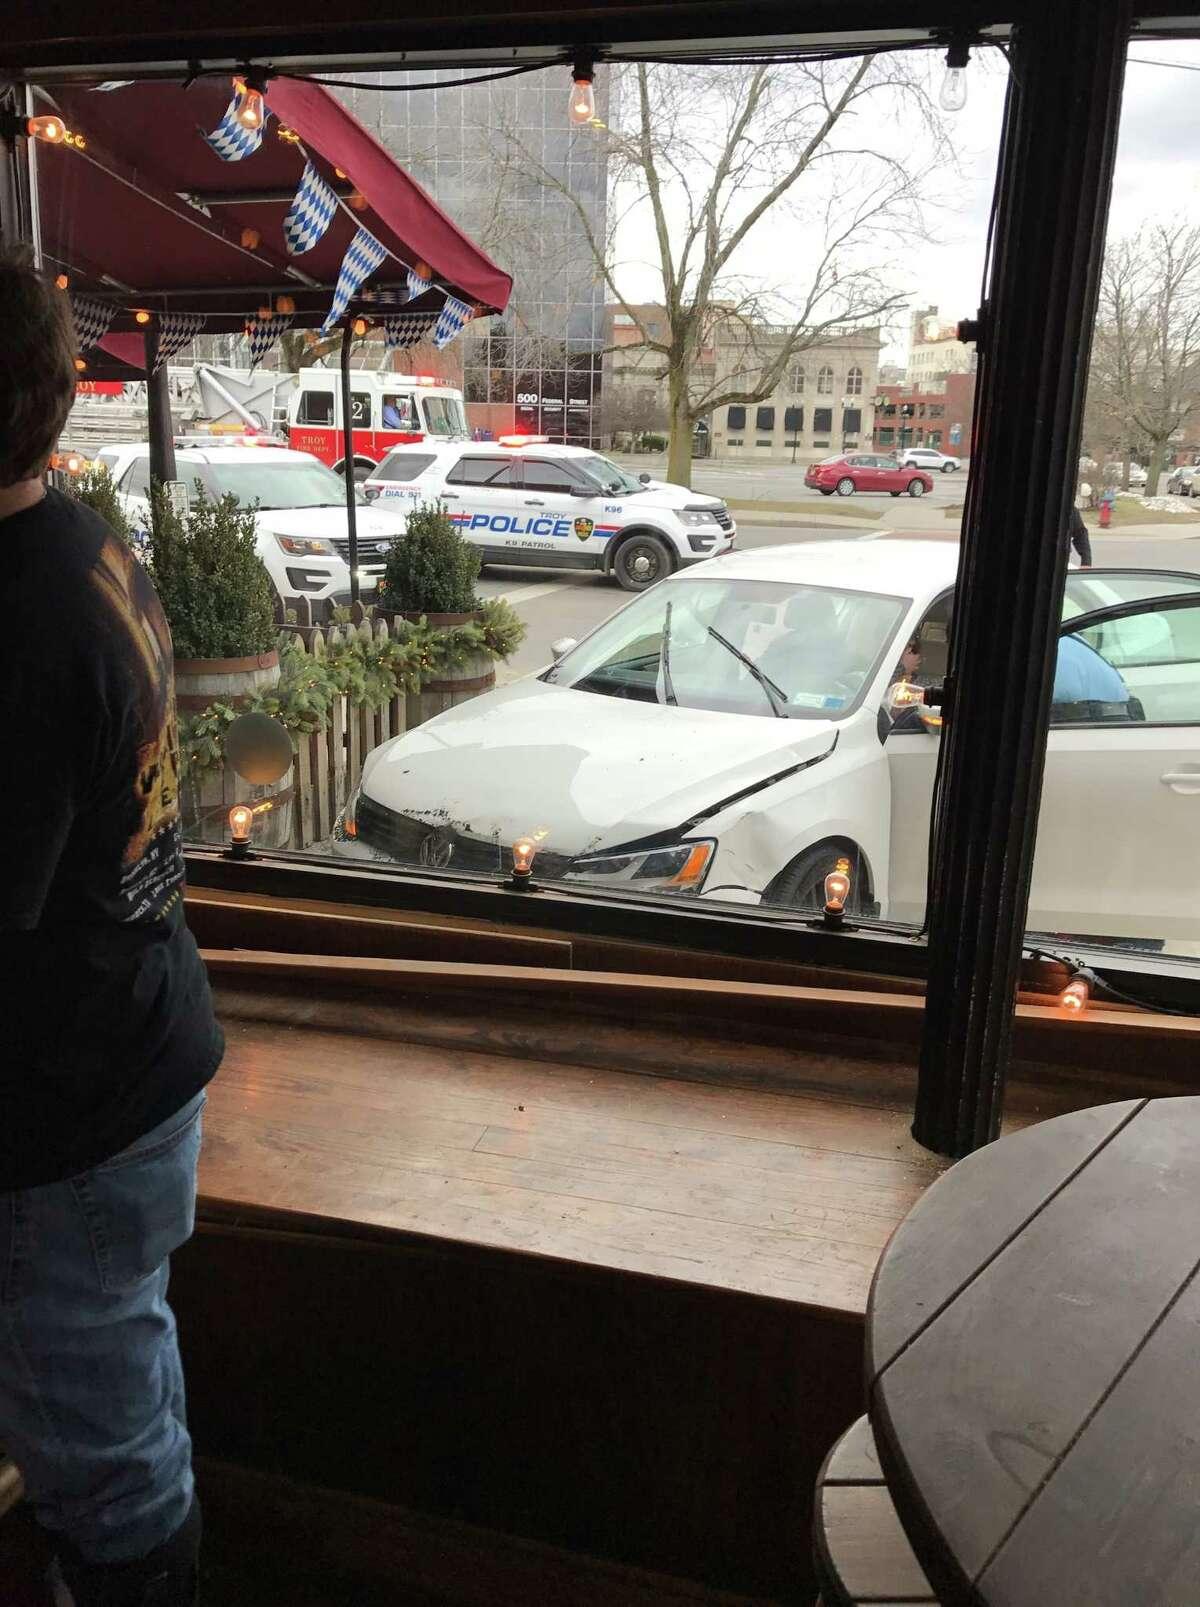 A car crashed outside Wolff's Biergarten in Troy on Saturday, Feb. 25, 2017.